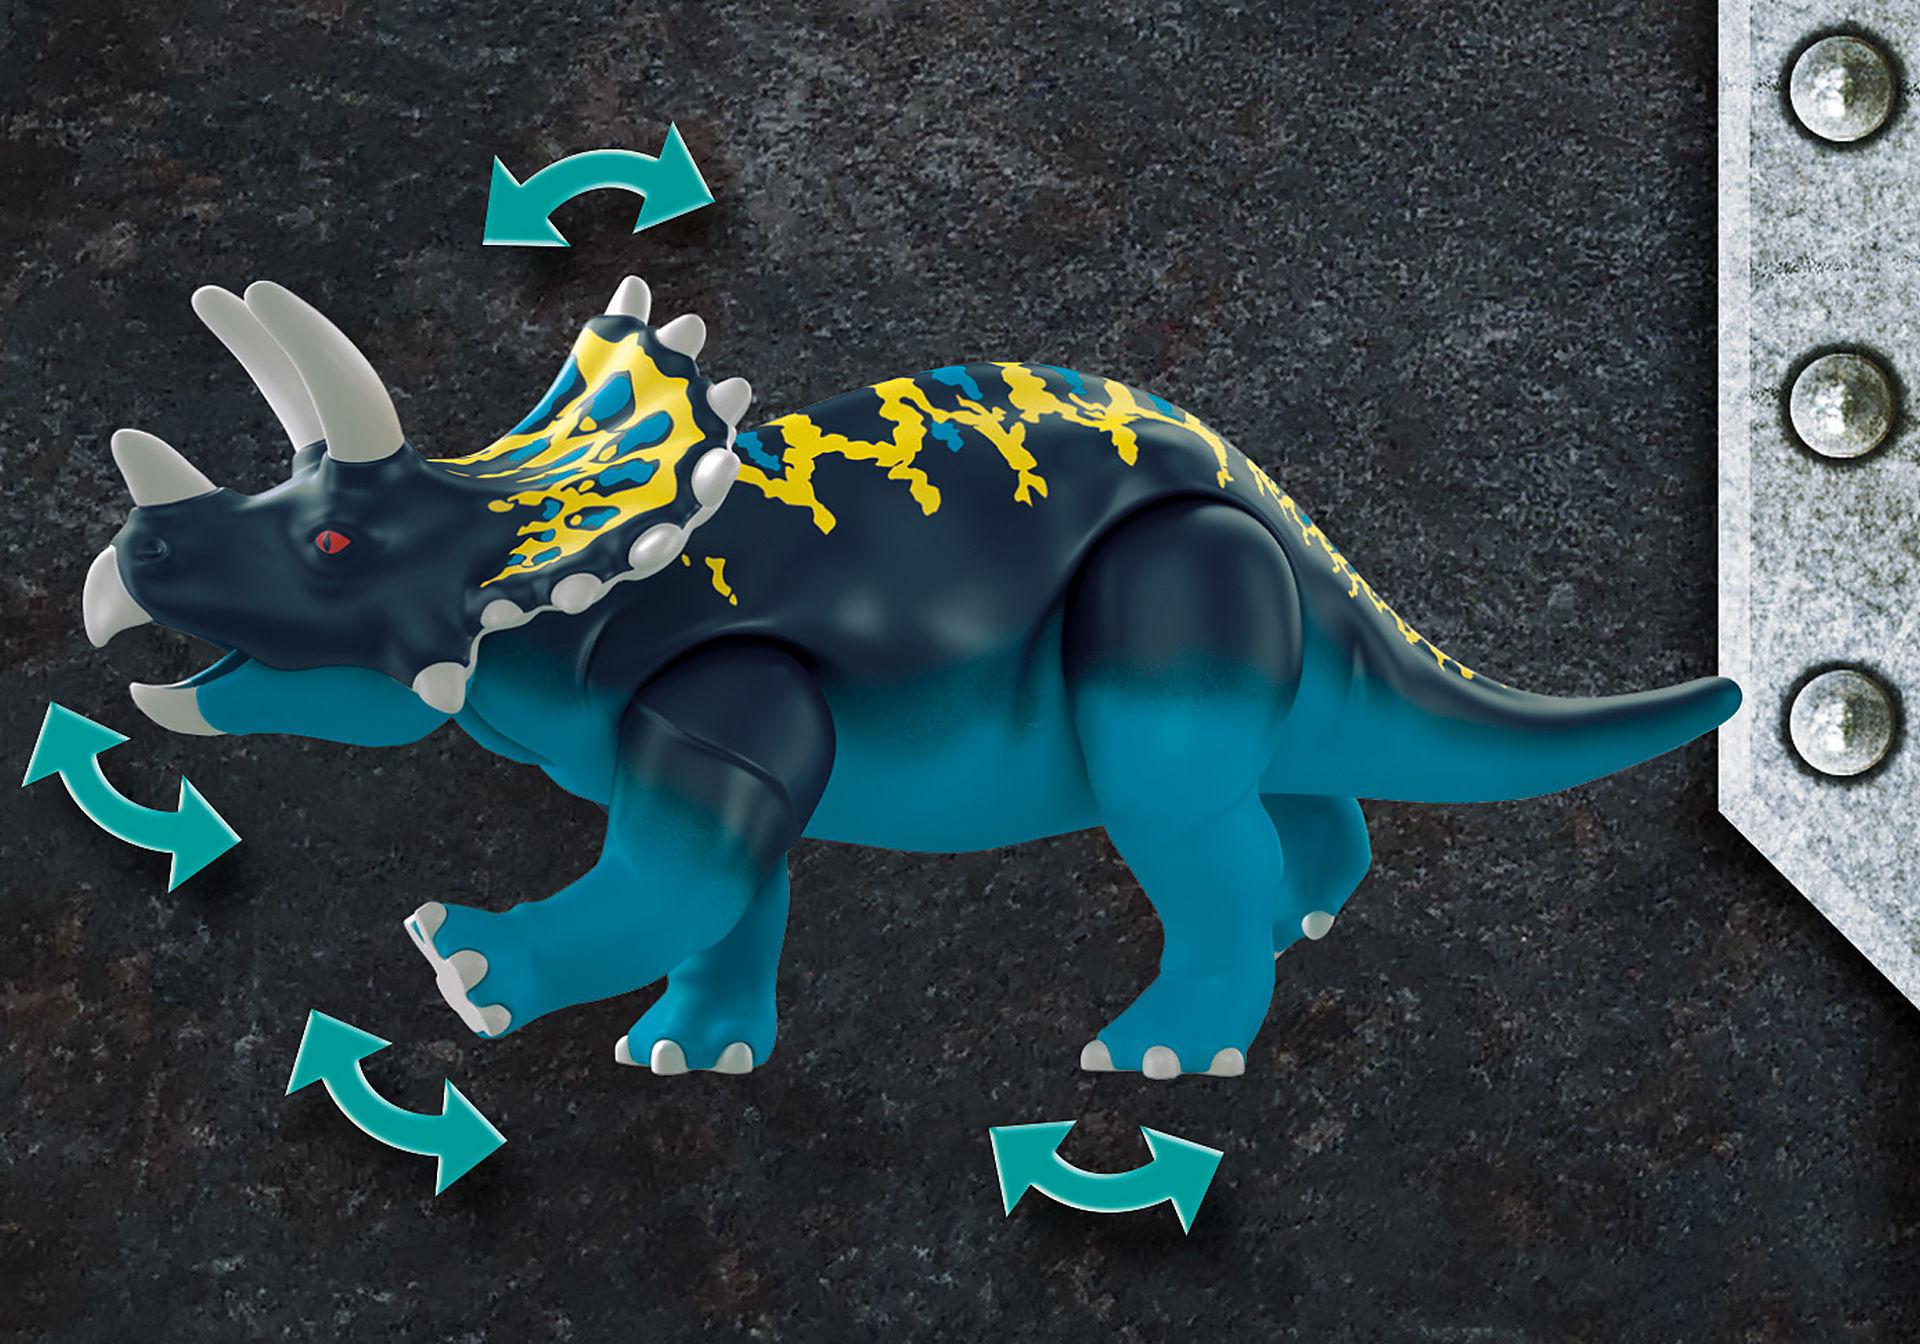 70627 Triceratops: Tumulto sobre as pedras lendárias  zoom image5